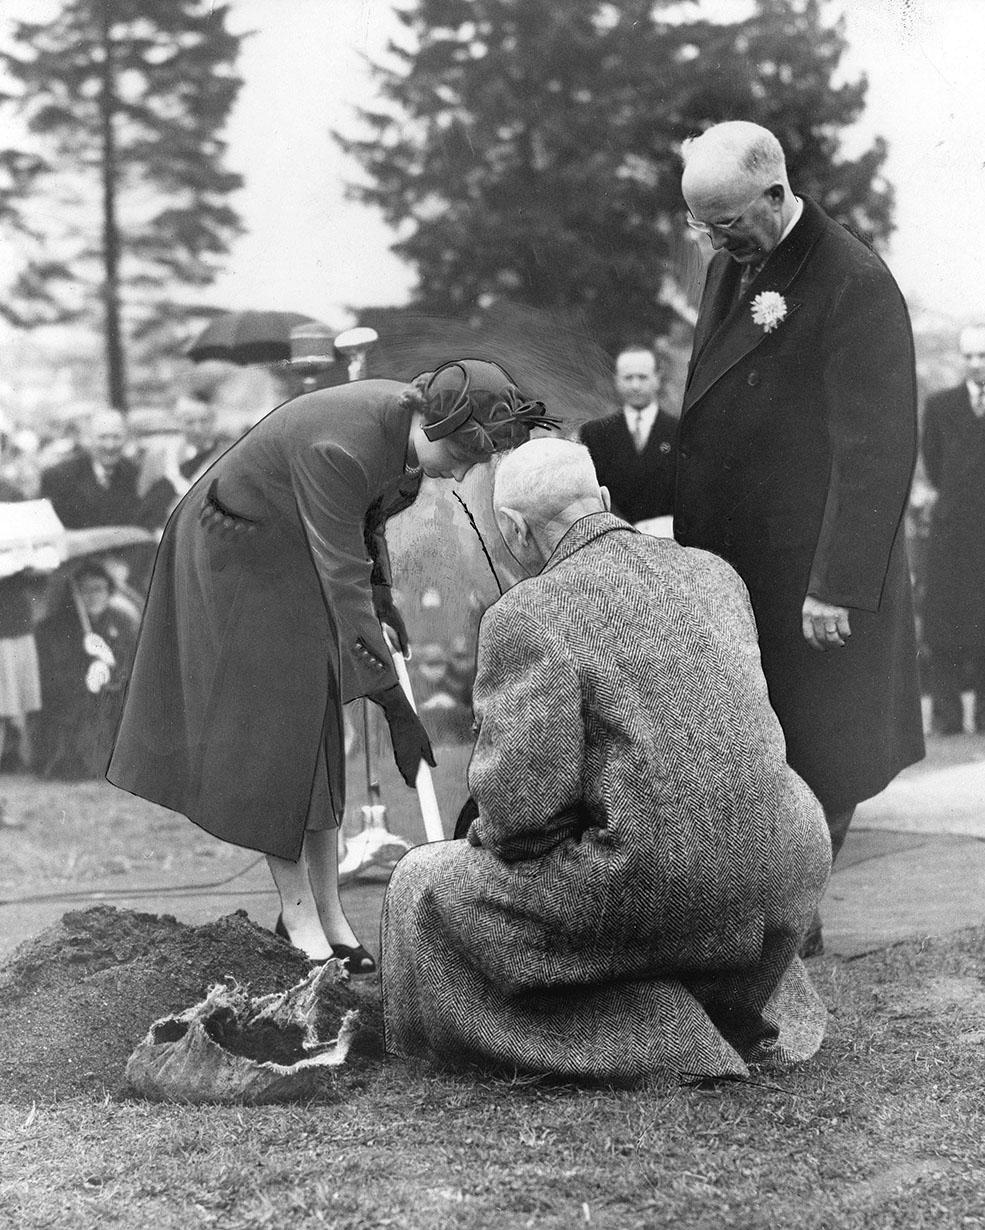 Princess Elizabeth planting a sapling in Queen Elizabeth Park in 1951 (Public domain)